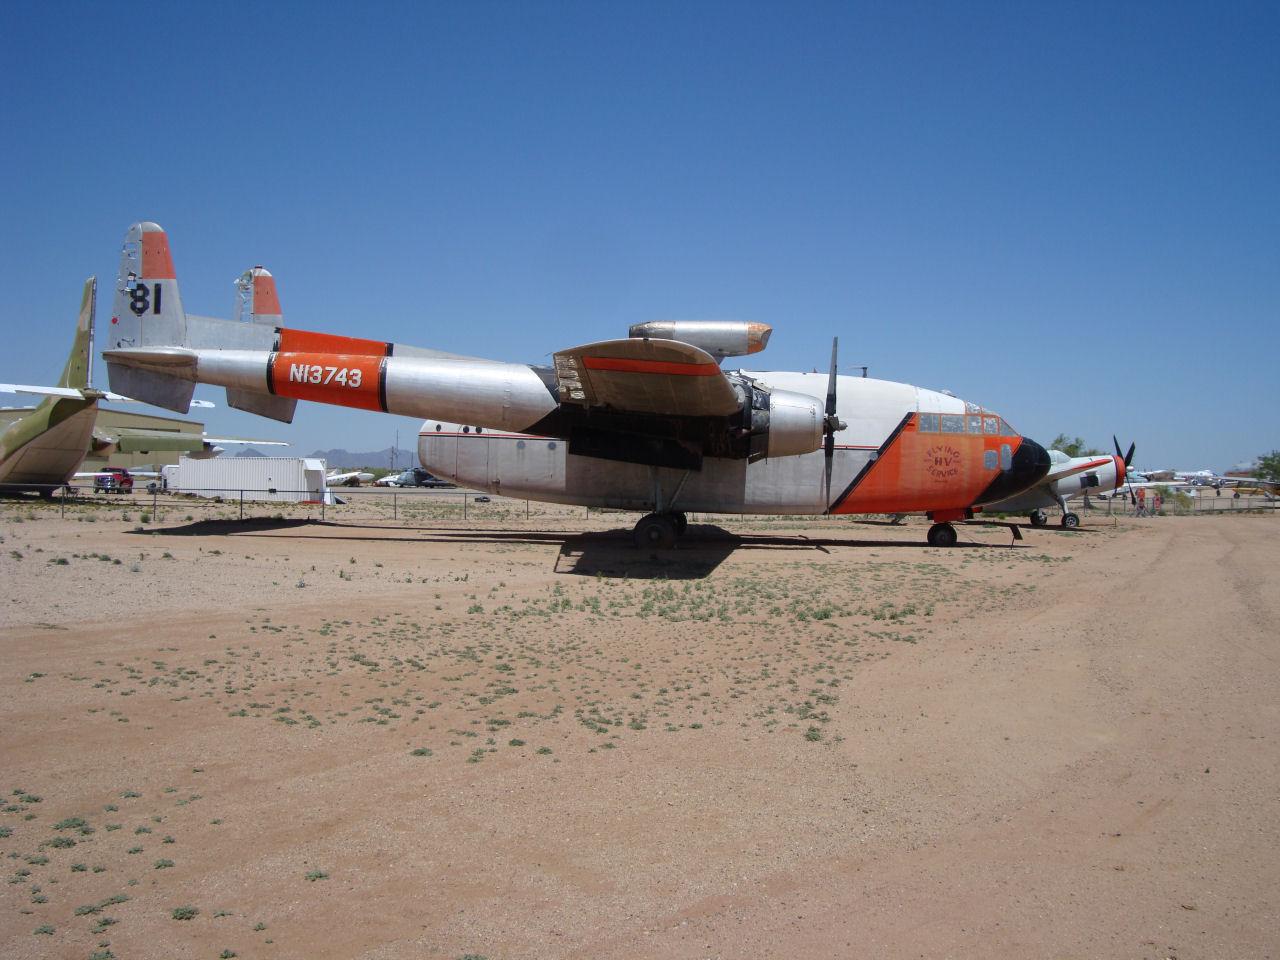 Fairchild C-119C Flying Boxcar Fire Tanker Photo Walk Around